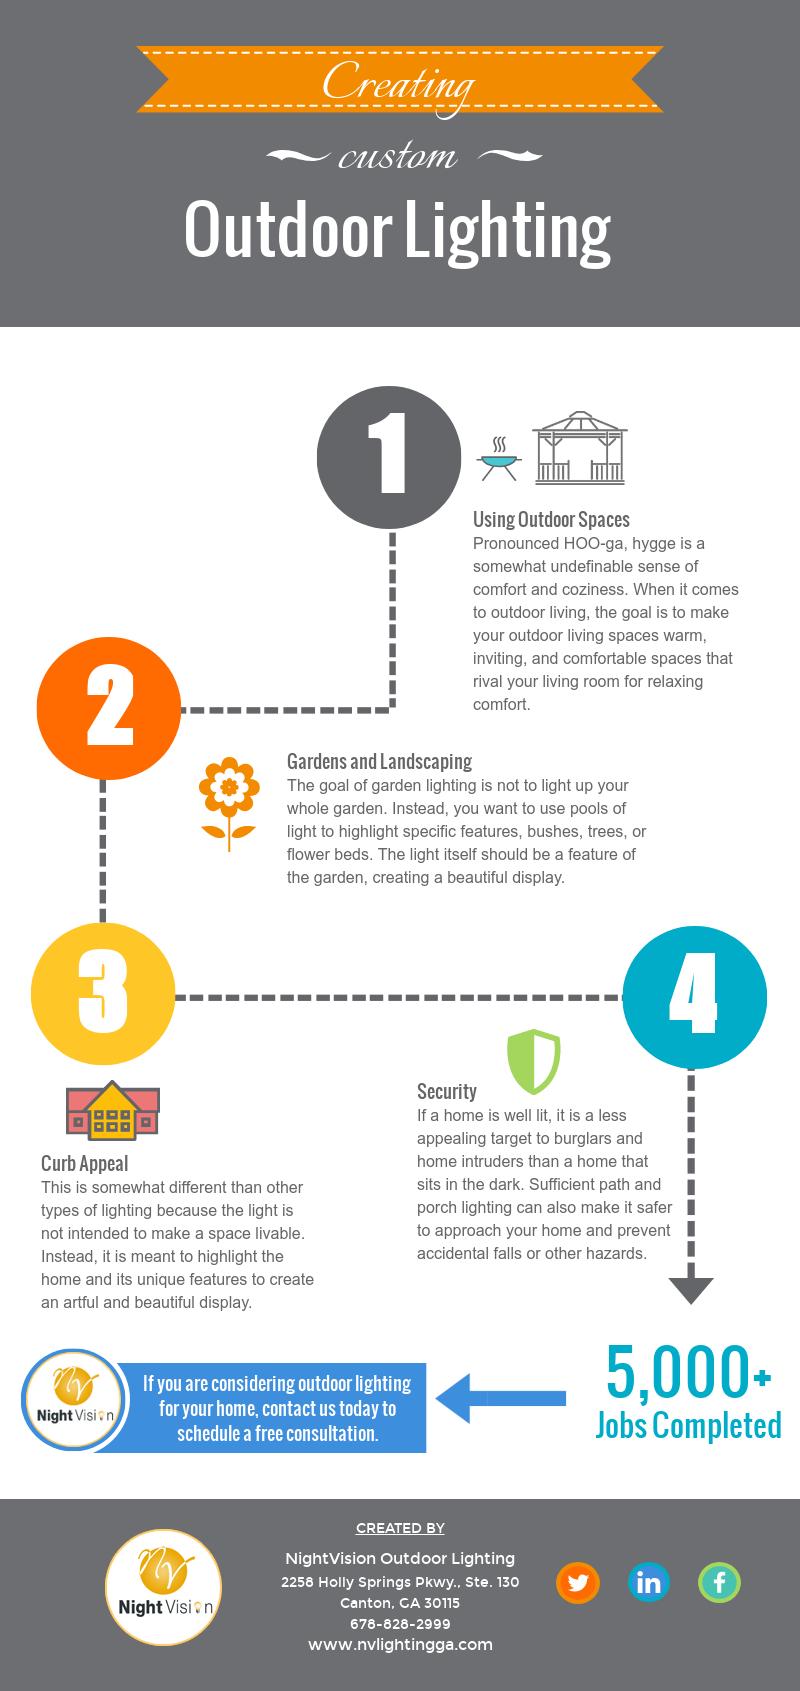 Creating Custom Outdoor Lighting [infographic]